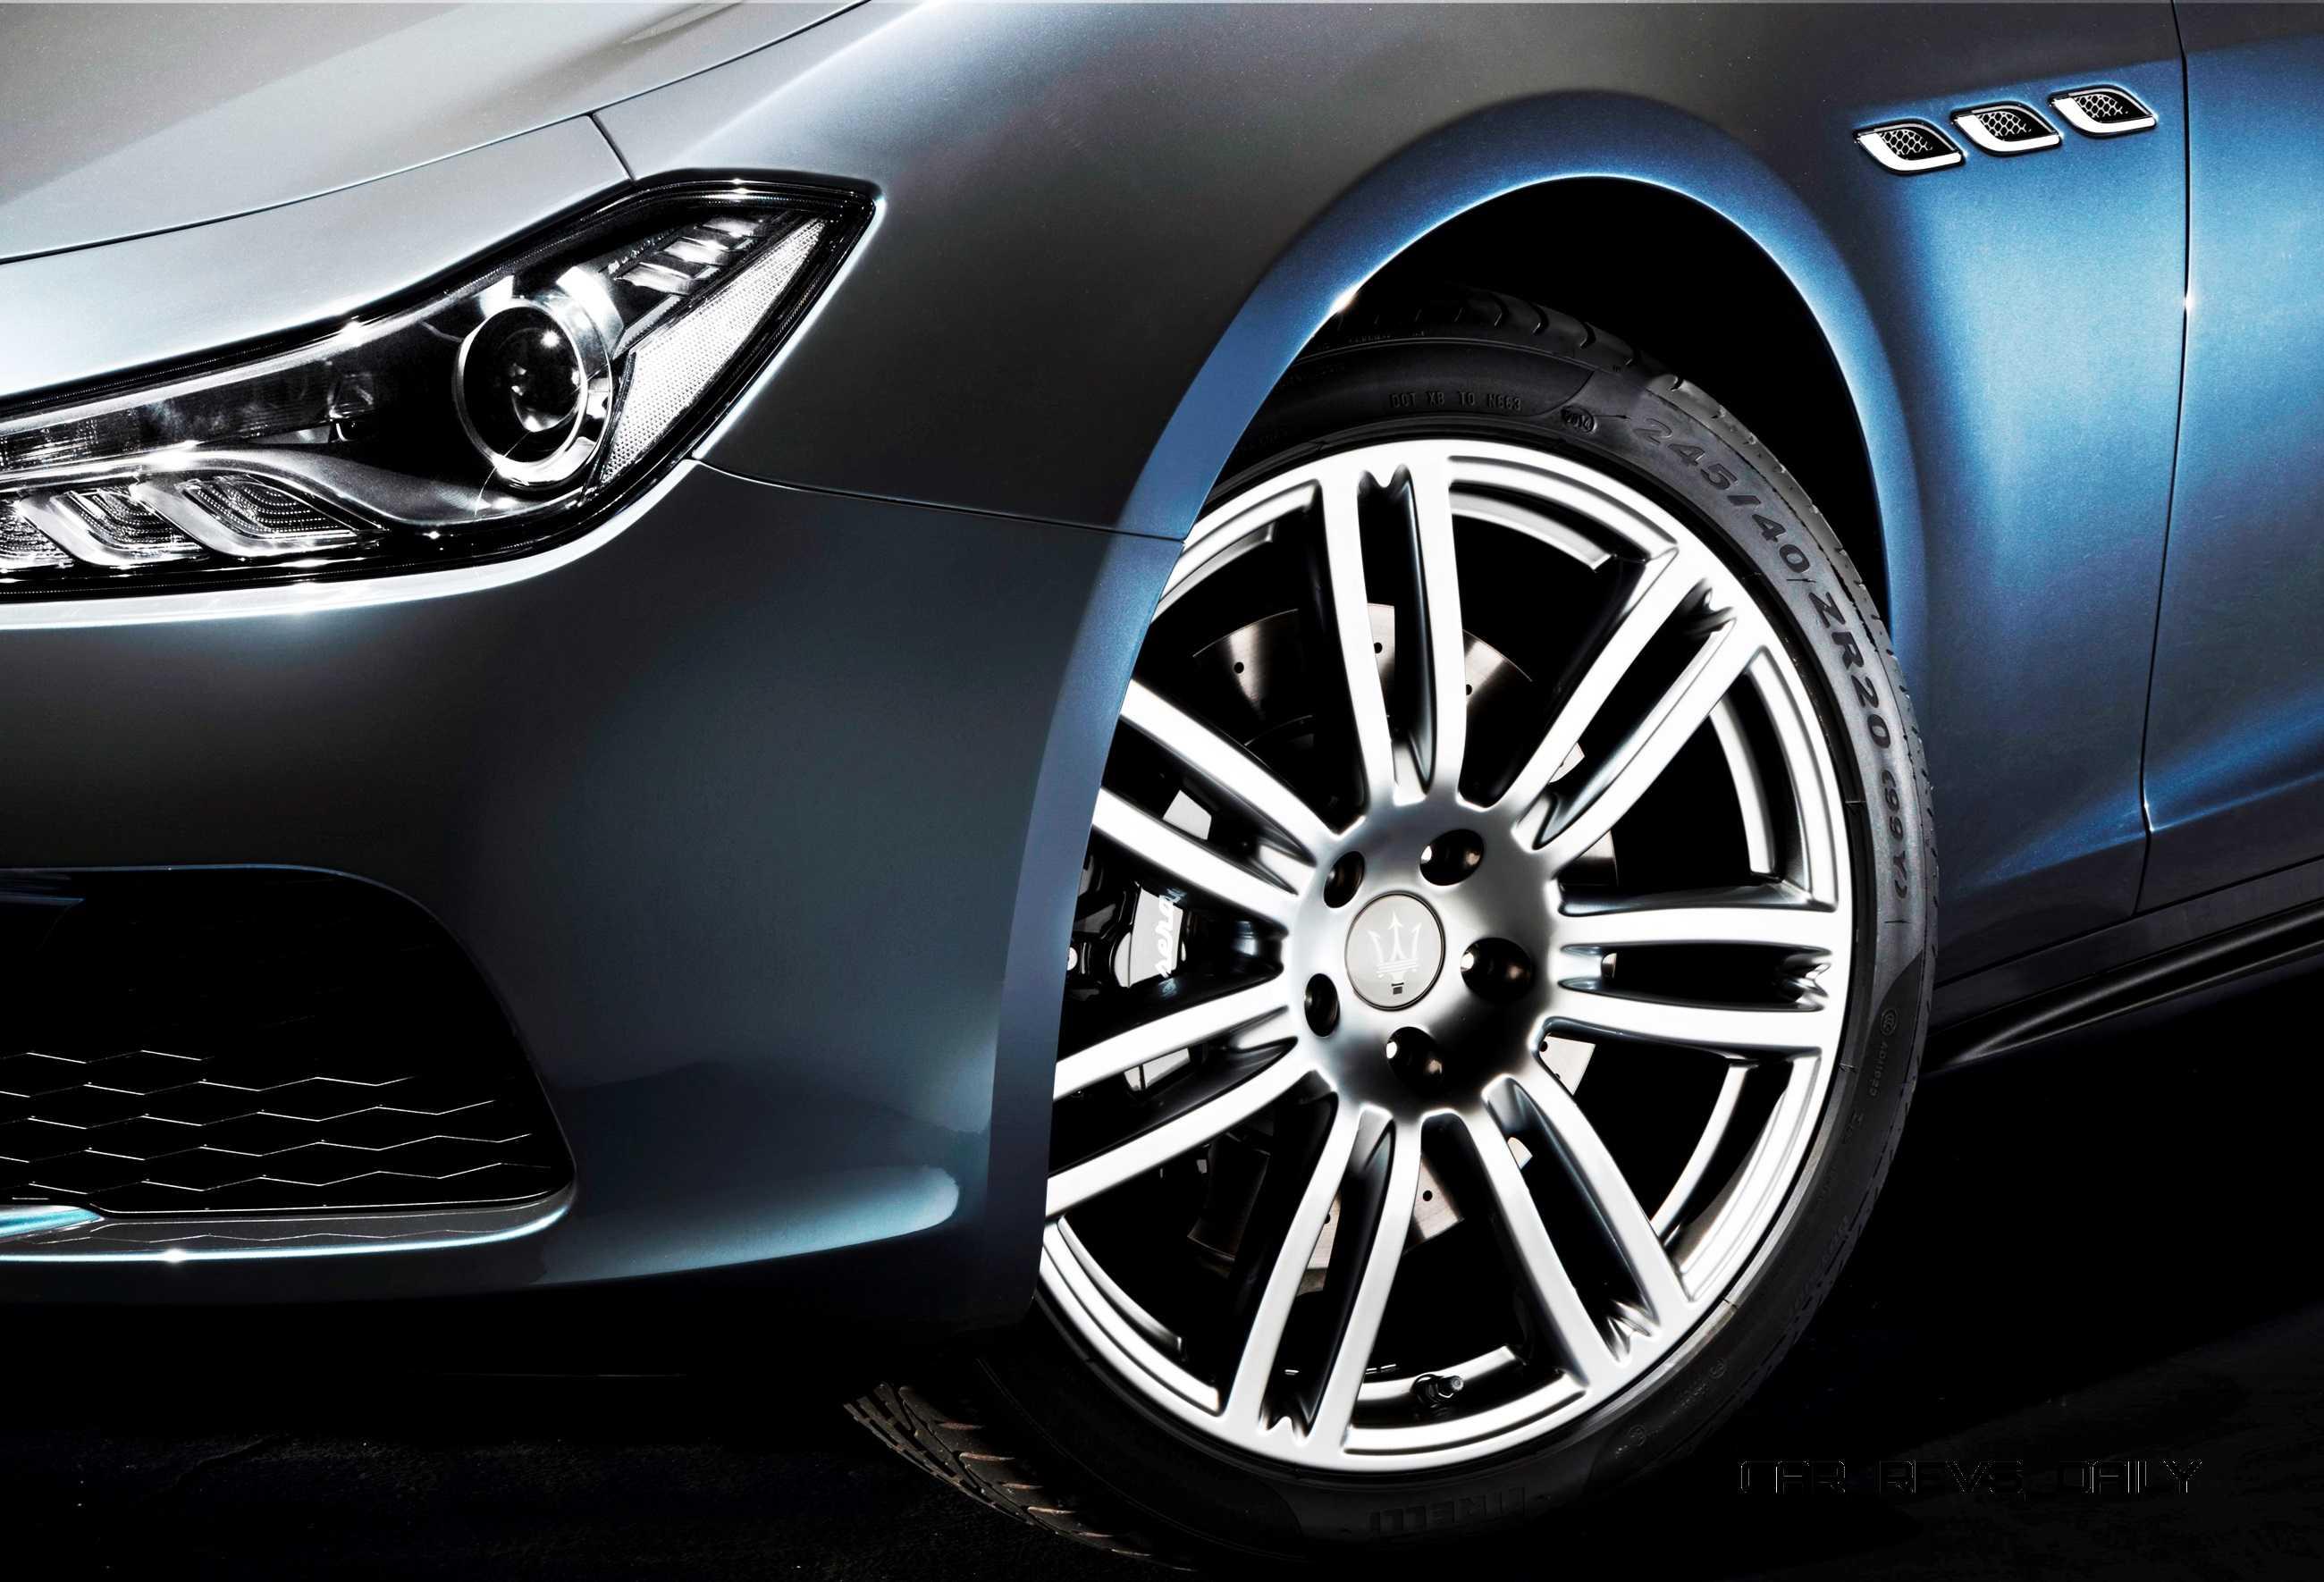 http://www.car-revs-daily.com/wp-content/uploads/2014/10/2015-Maserati-Ghibli-S-Q4-ZEGNA-EDITION-12.jpg